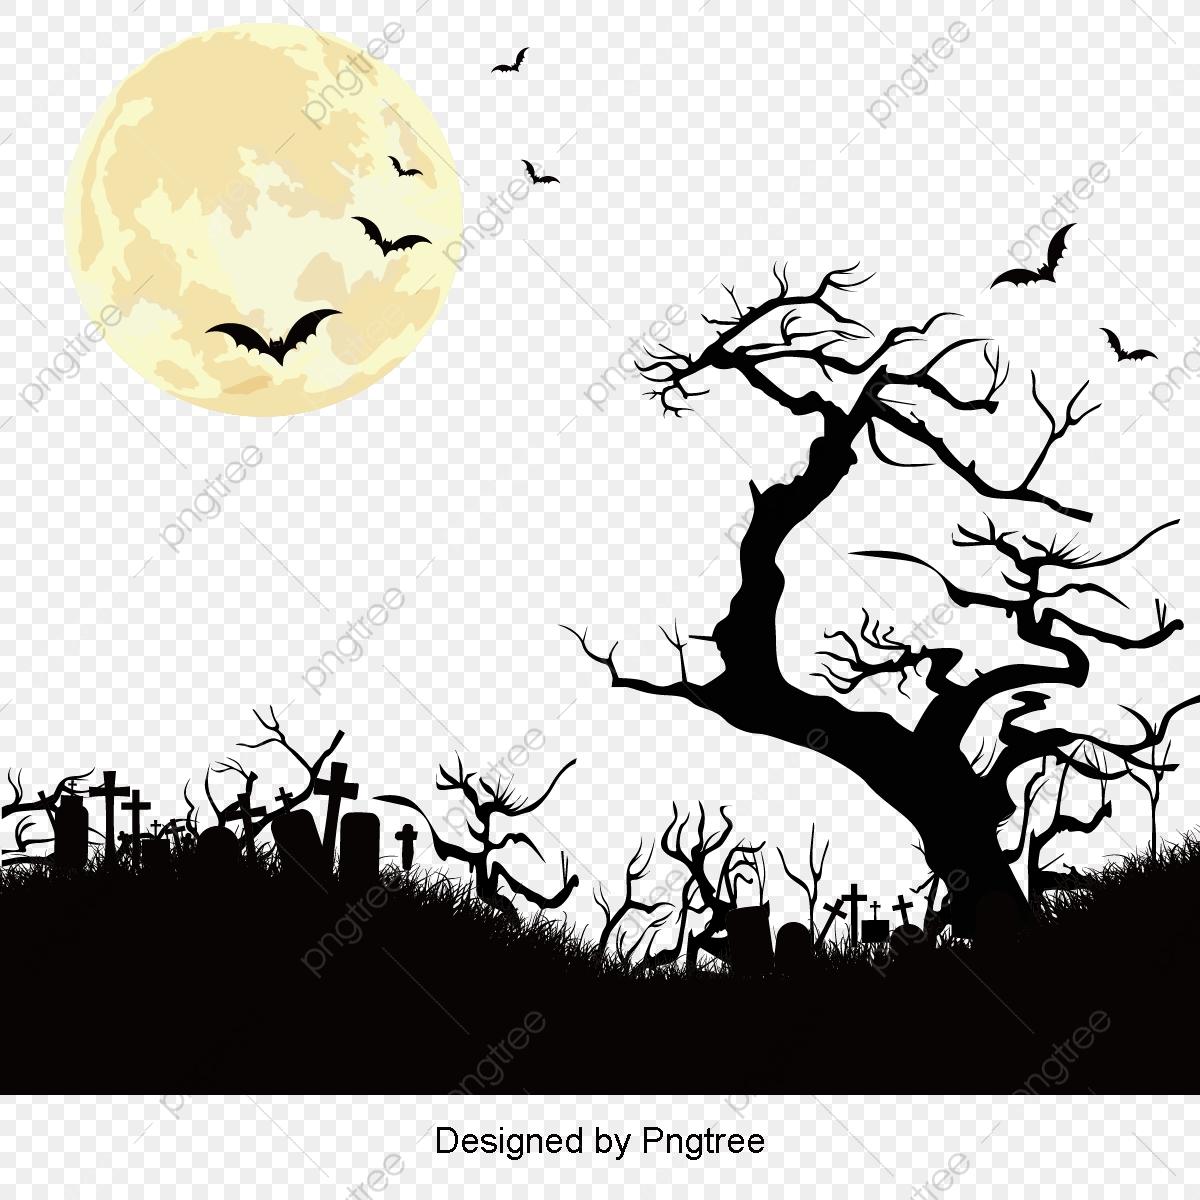 Modèle De Conception Halloween Simple Dessin Animé La Mode